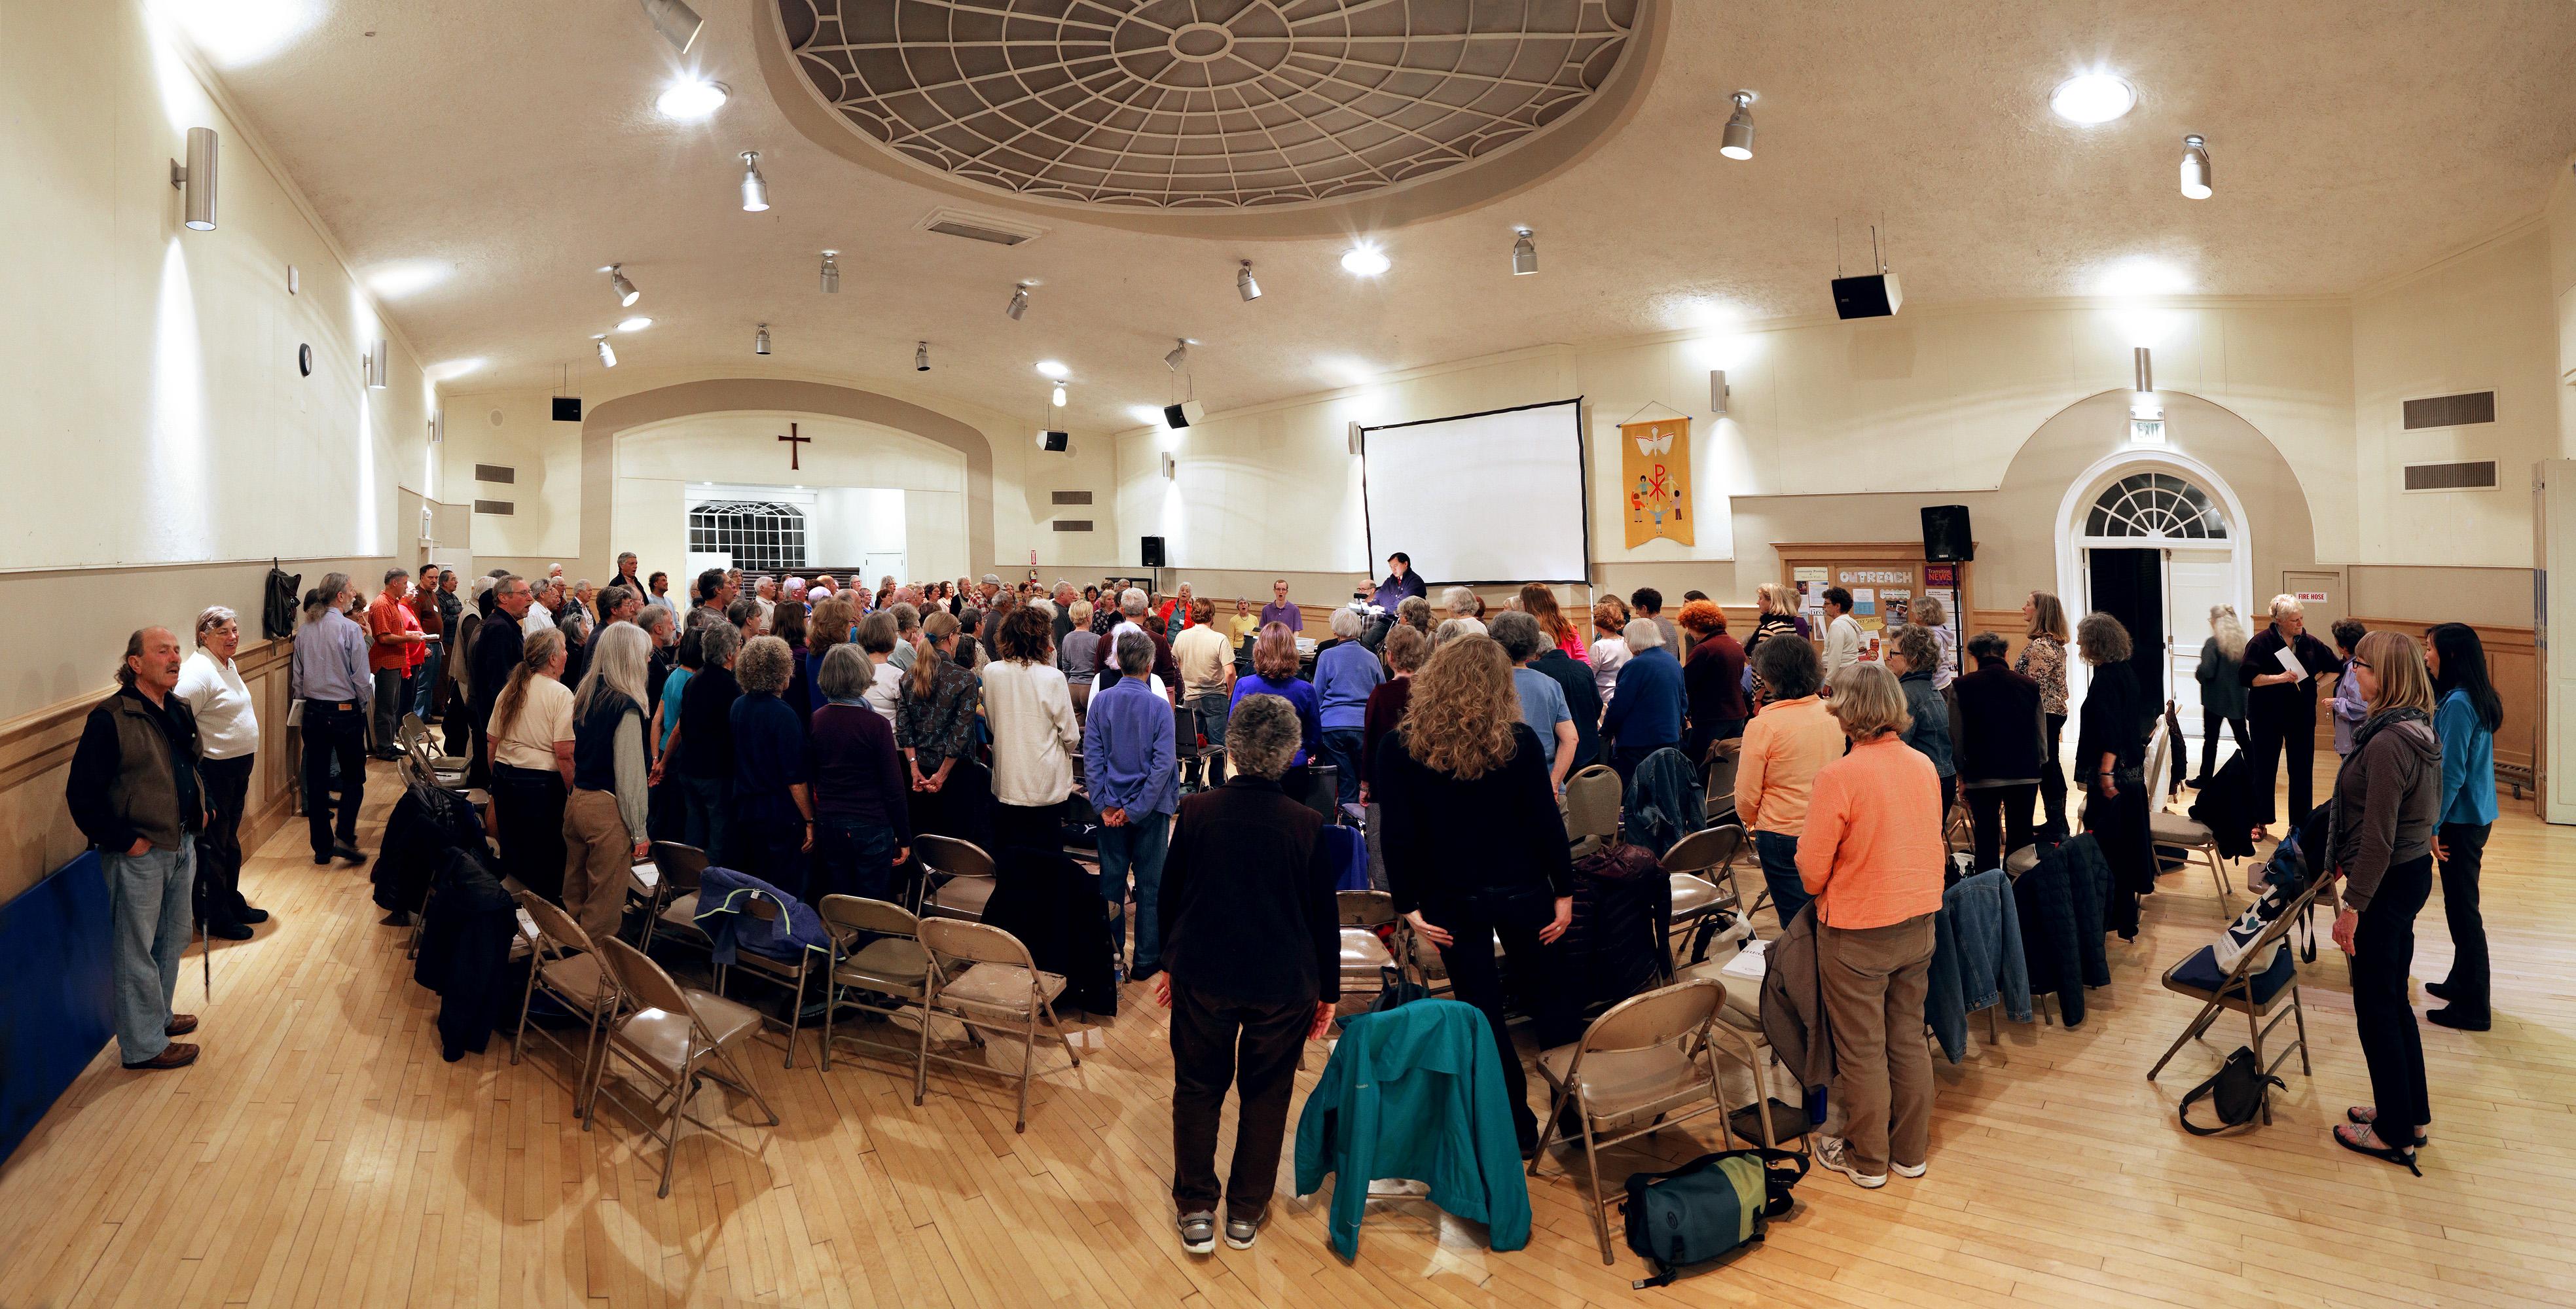 practicepanA Choir Practice,  First Congregational Church meeting room,  (burned 2016),  Berkeley, California, 2015